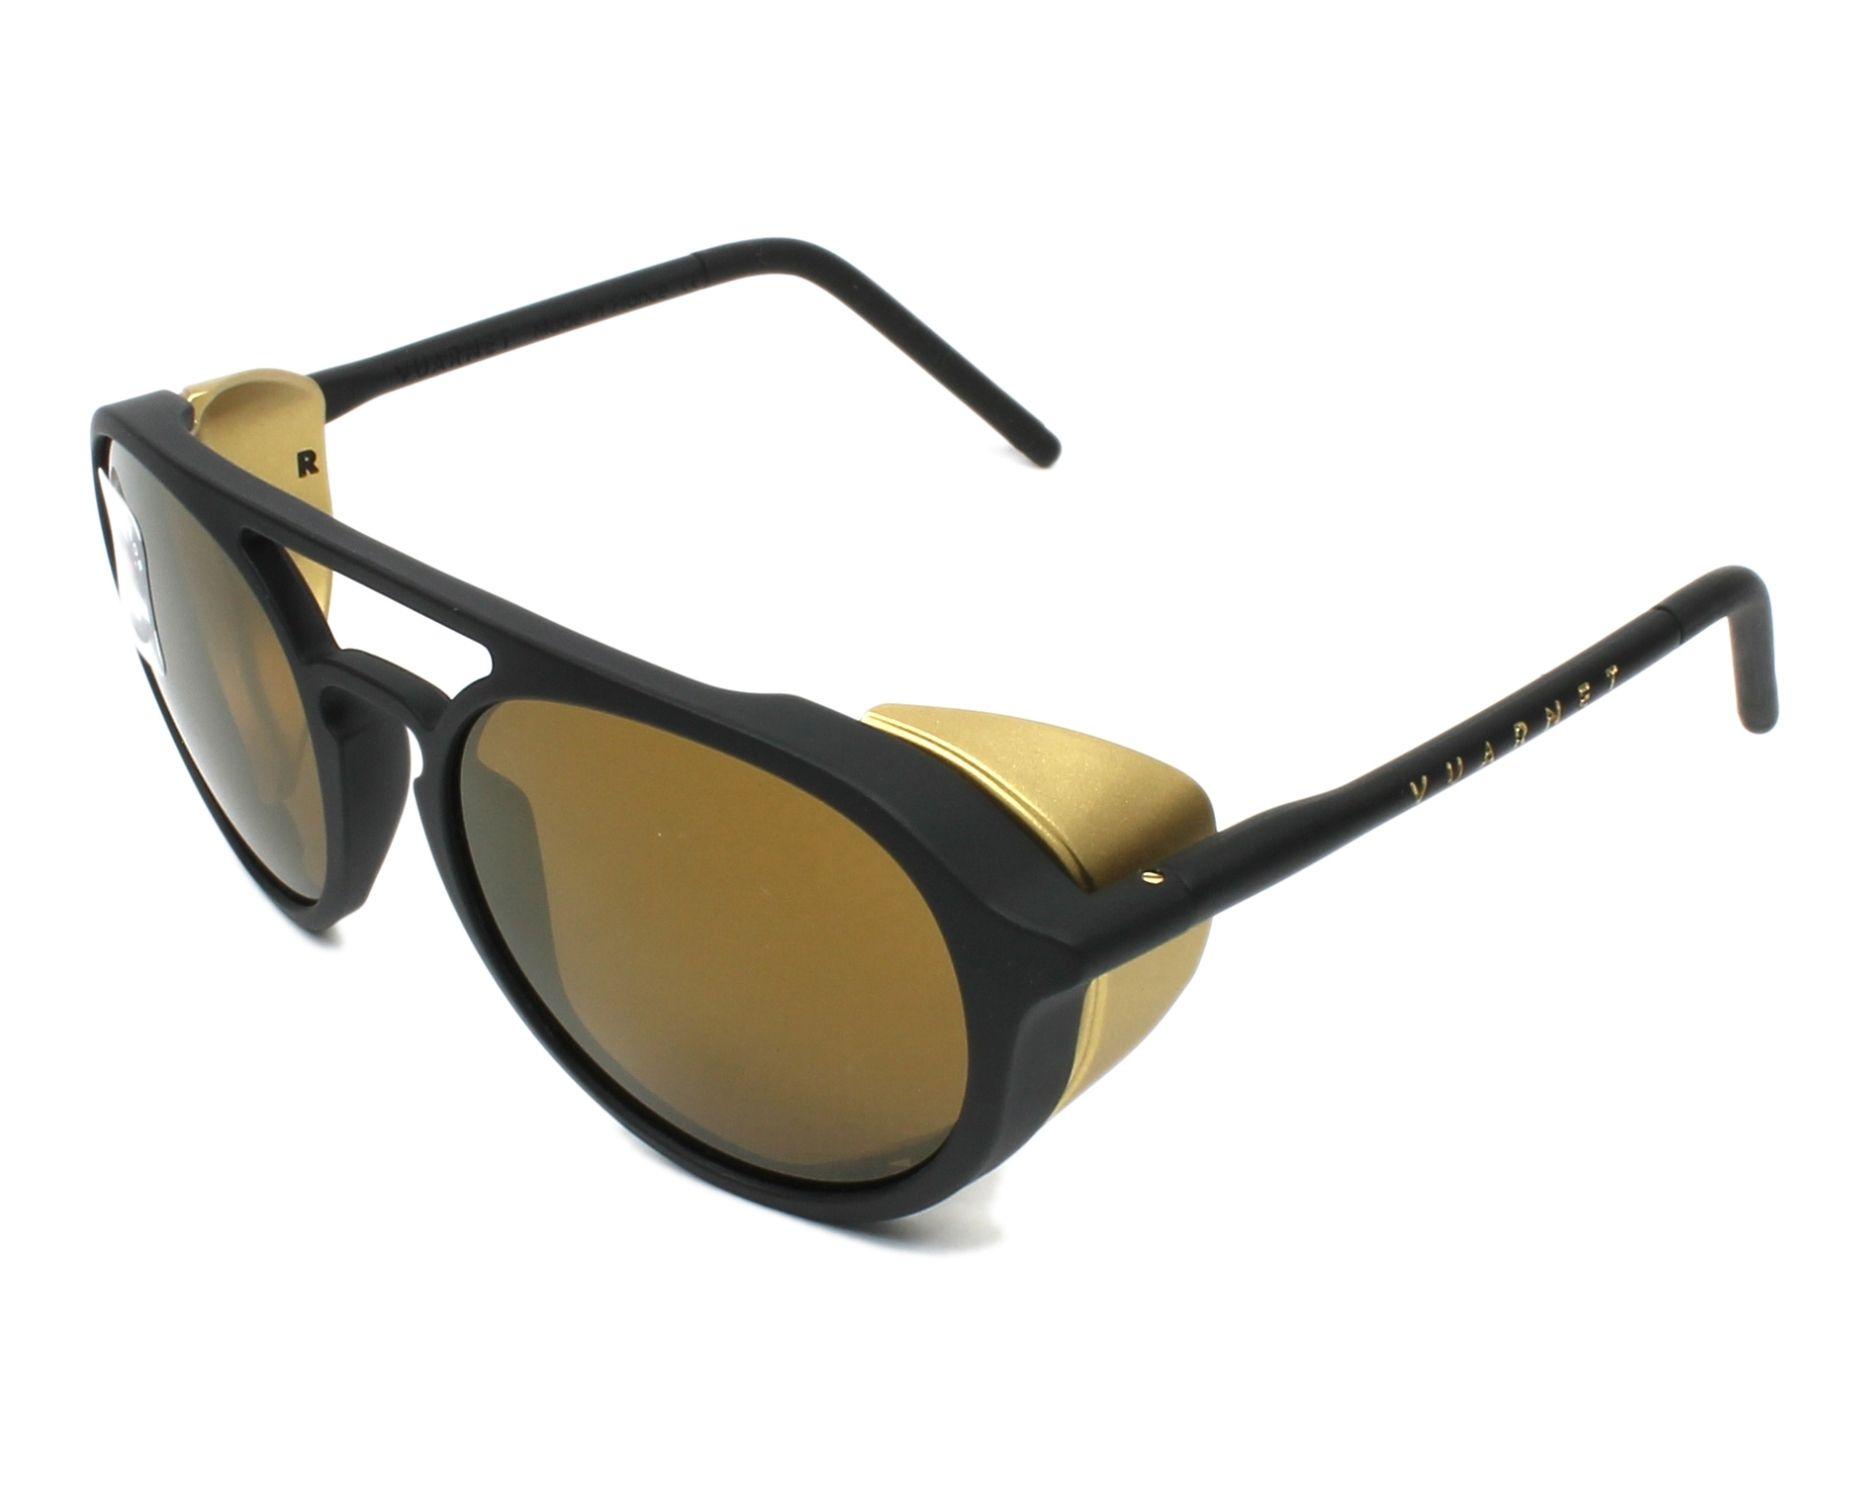 be249d960f693 Sunglasses Vuarnet VL-1709 0007-2129 51-18 Black Gold profile view